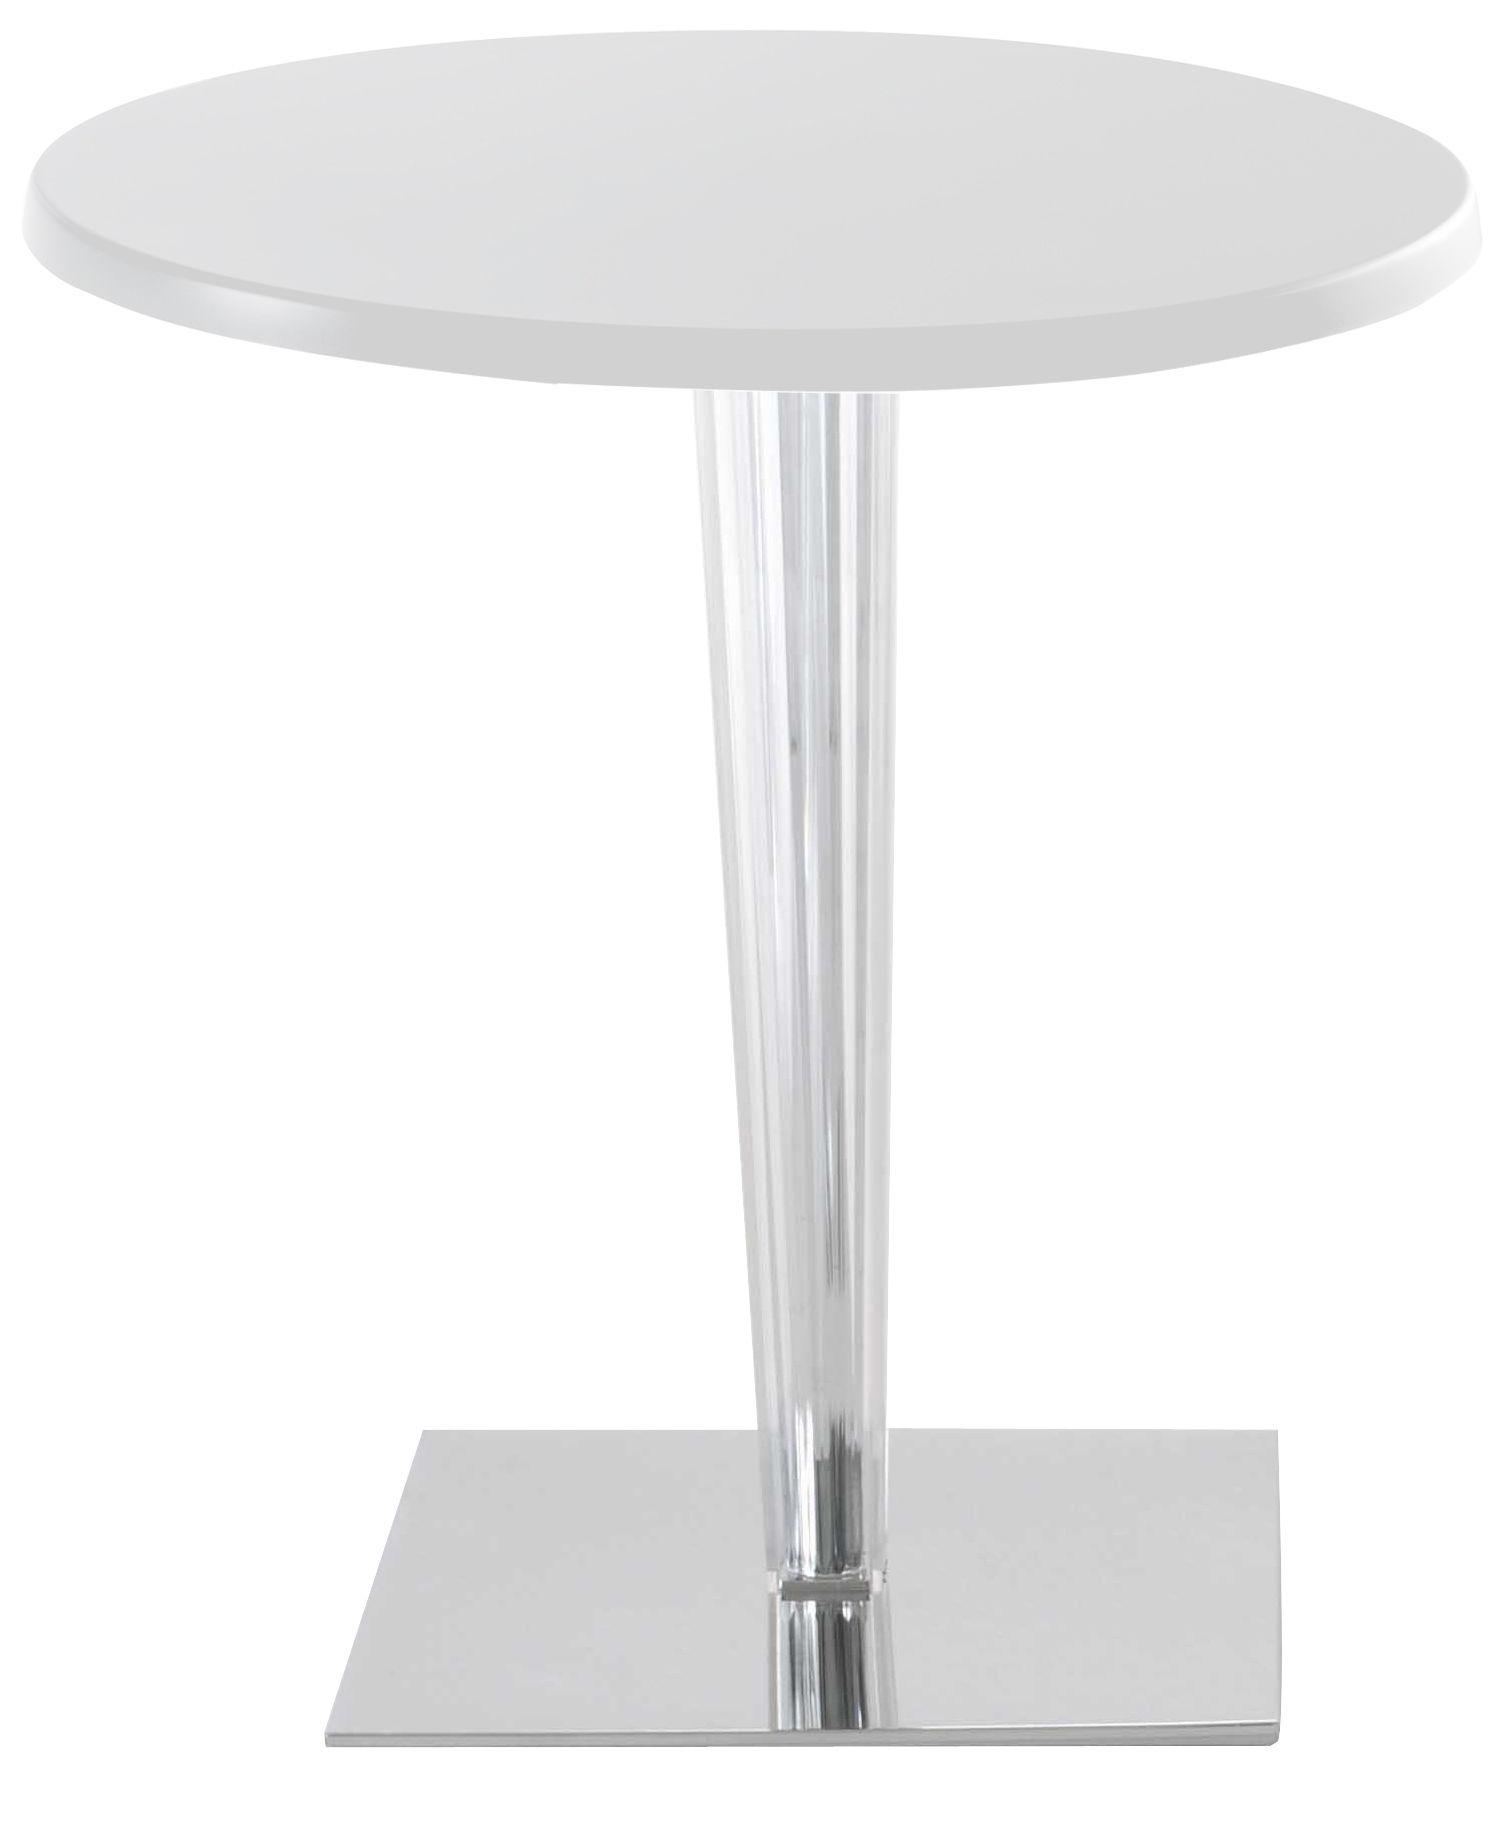 Mobilier - Tables - Table ronde Top Top / Laquée - Ø 70 cm - Kartell - Blanc/ pied carré - Aluminium, PMMA, Polyester laqué